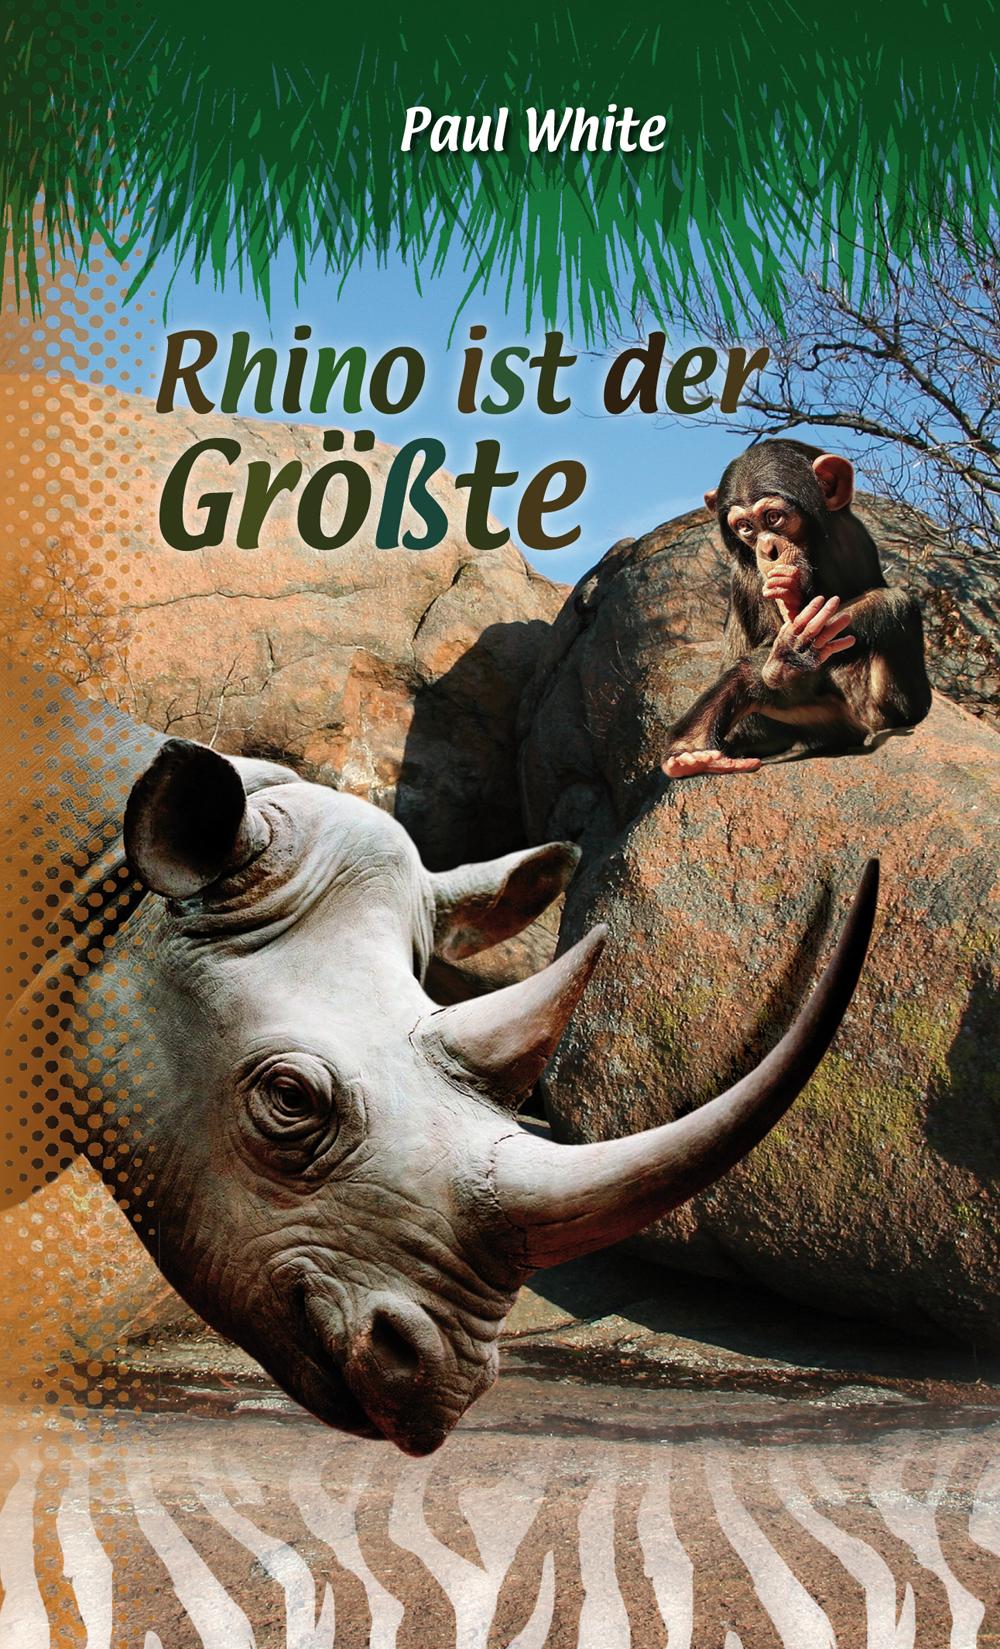 CLV_rhino-ist-der-groesste_paul-white_256118_1